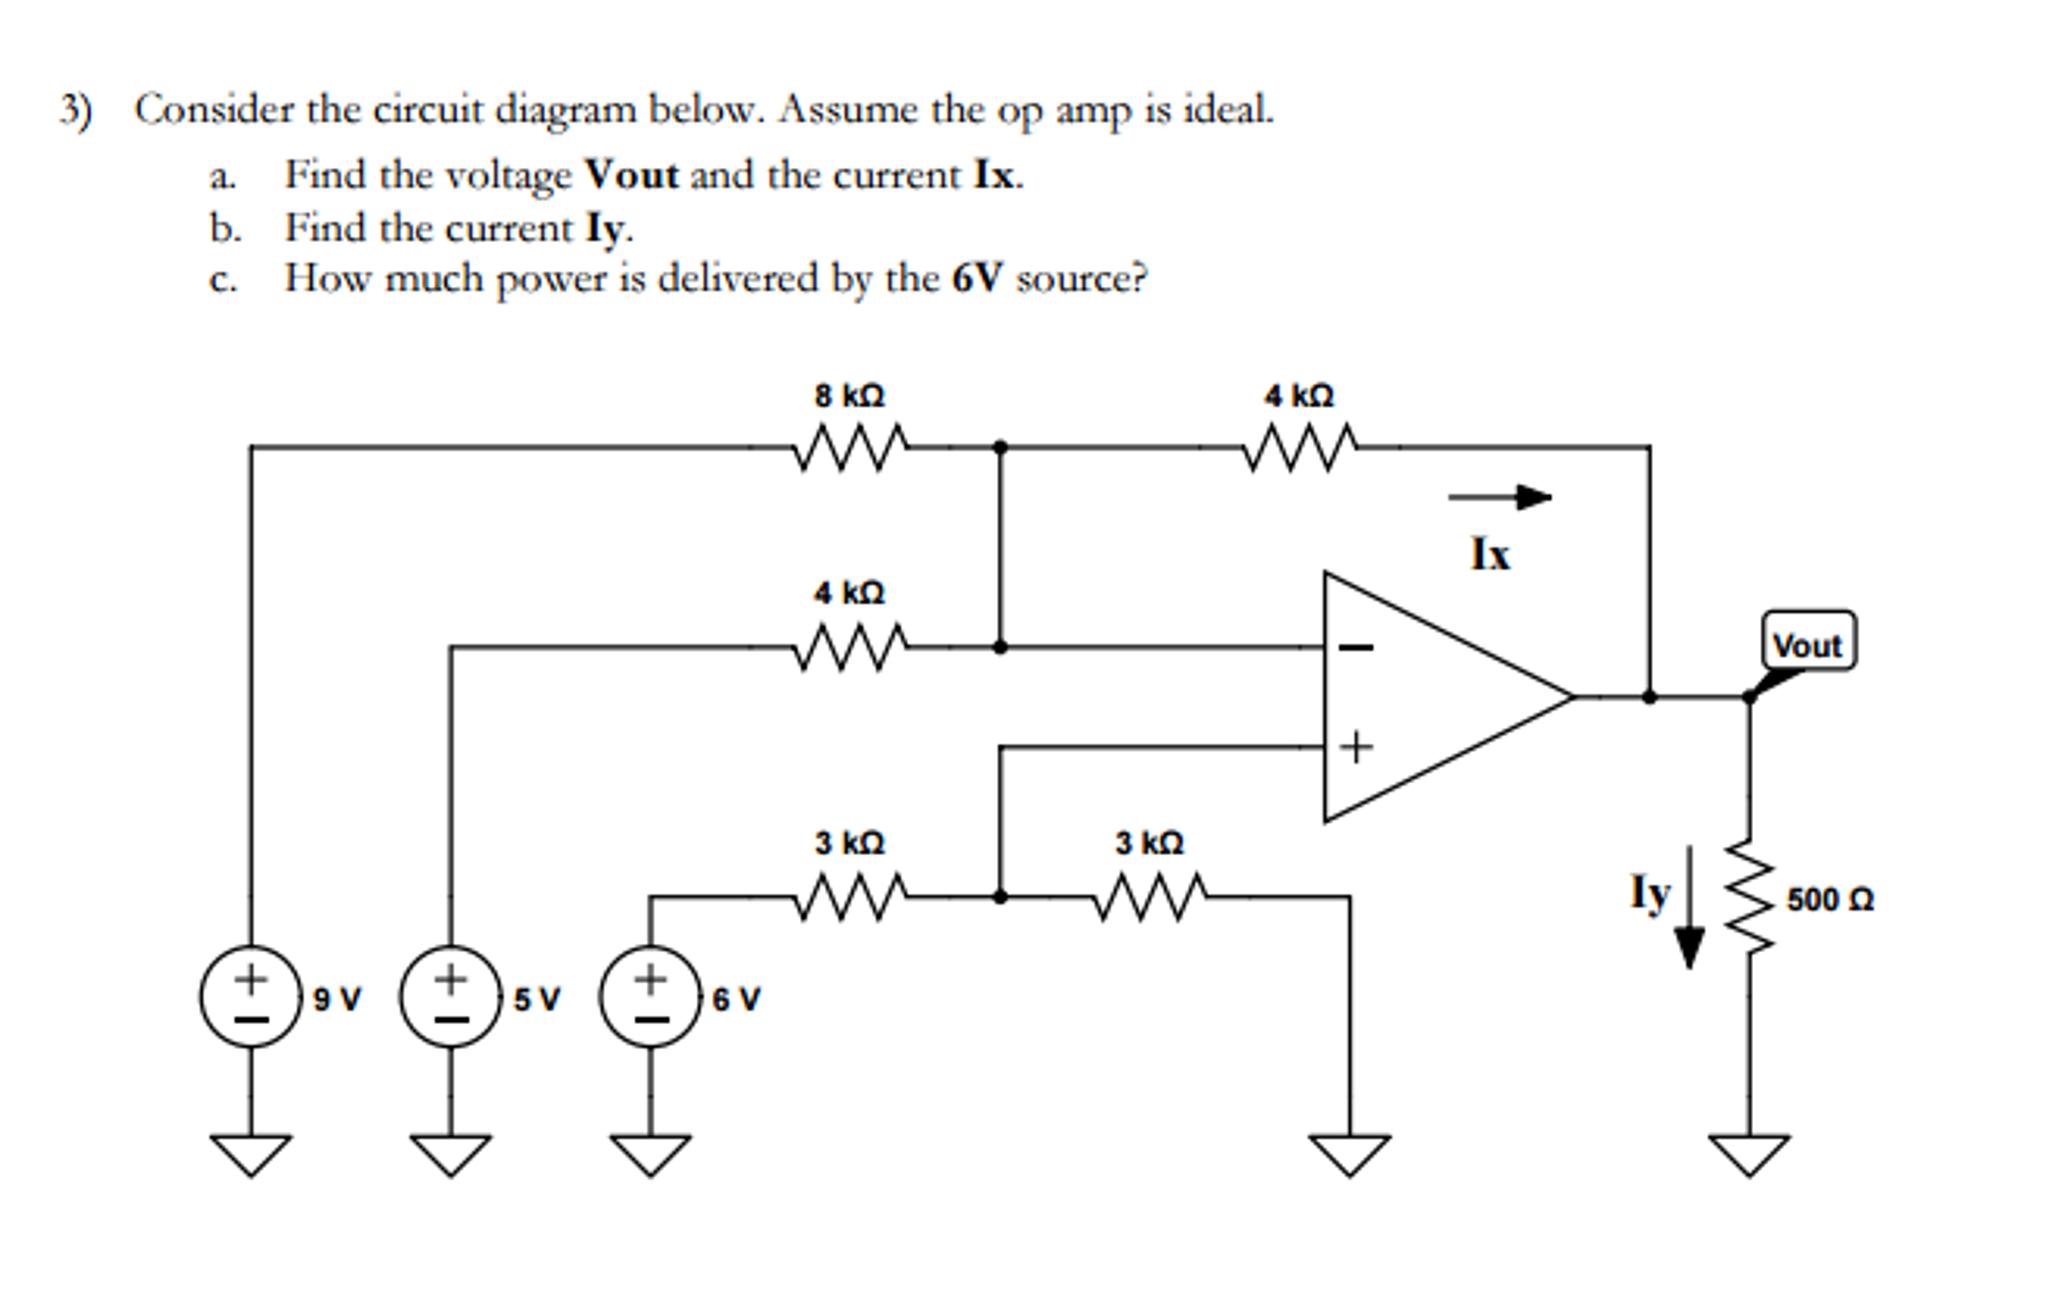 Op Amp Diagram Wiring Diagrams Schematics Propane Heat Control Wiring  Diagram Hx Chiller Wiring Diagram